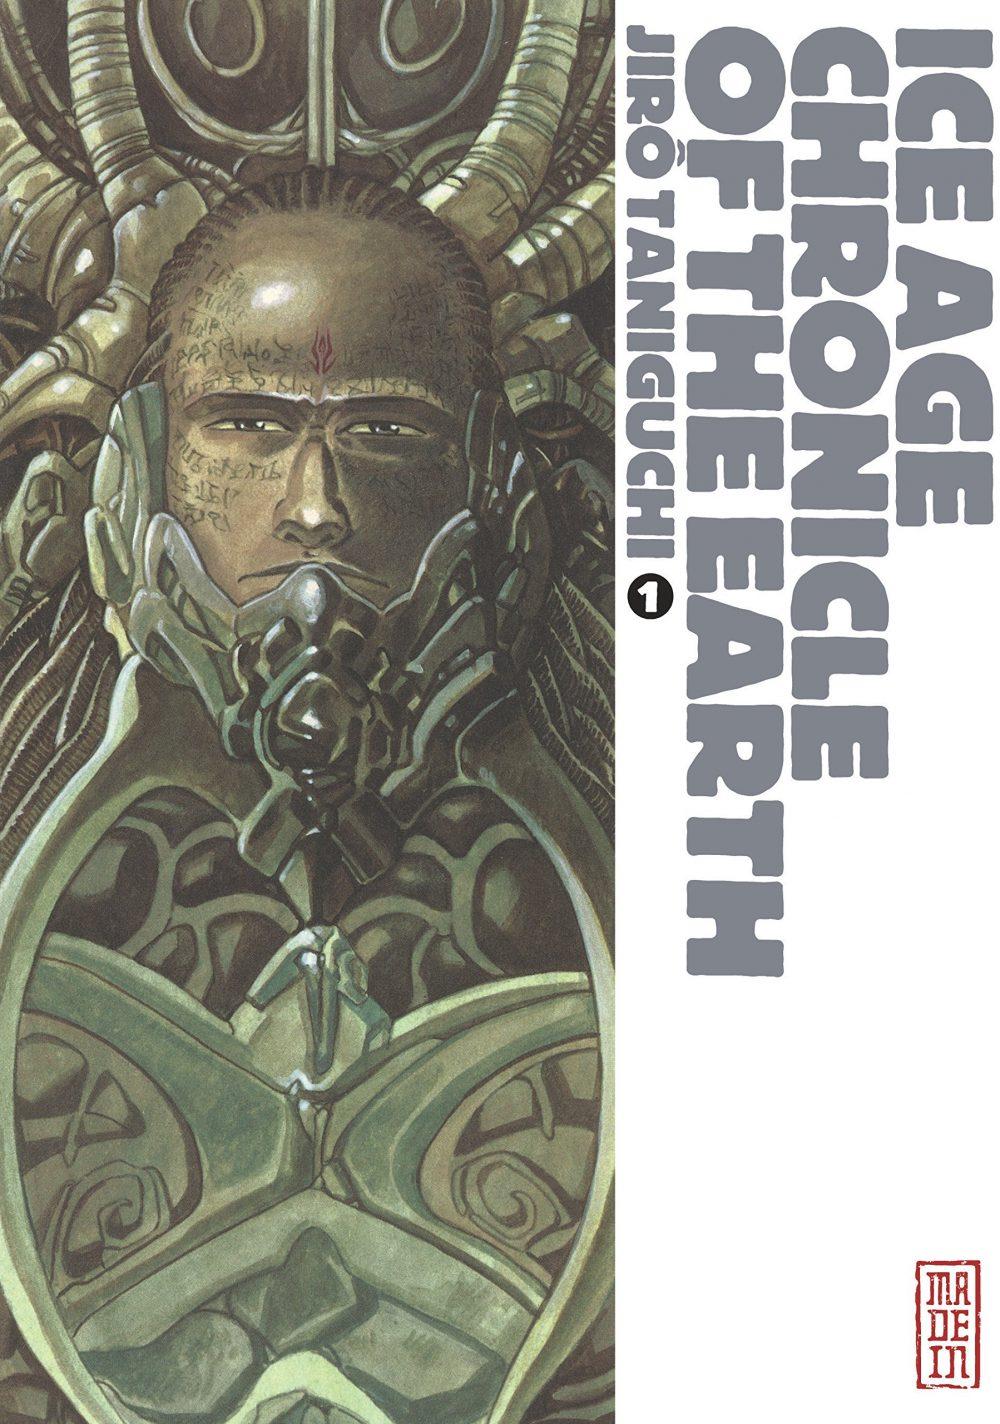 Ice Age Chronicles of the Earth 1, copertina di Jiro Taniguchi